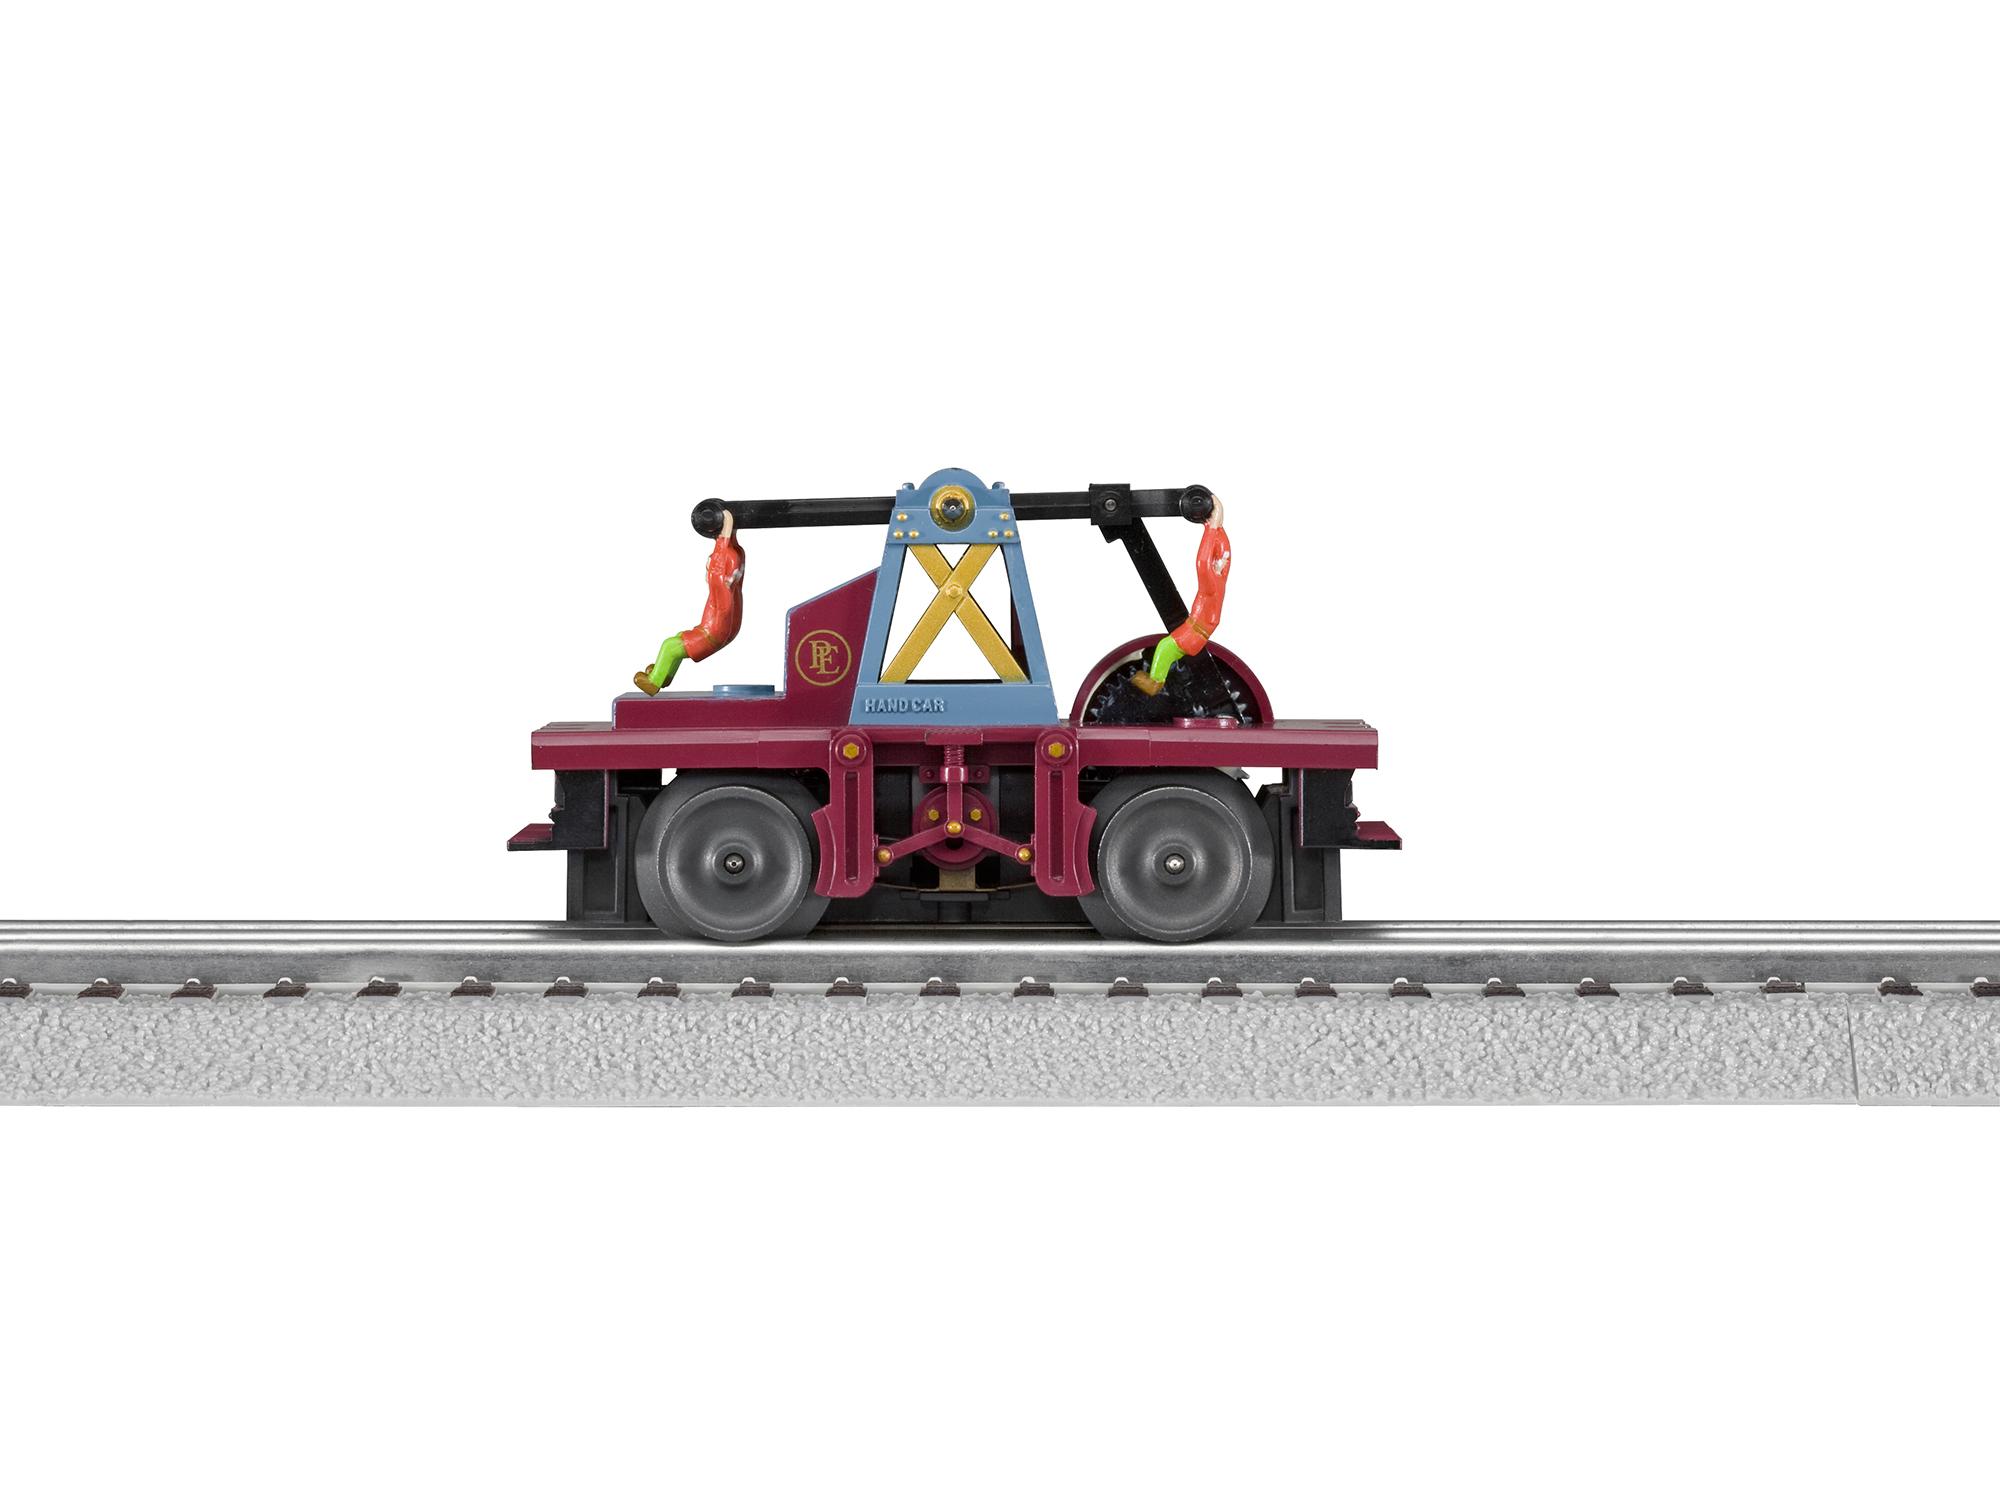 Lionel 628425 O Polar Exp Op Elf Hand Car 434-628425